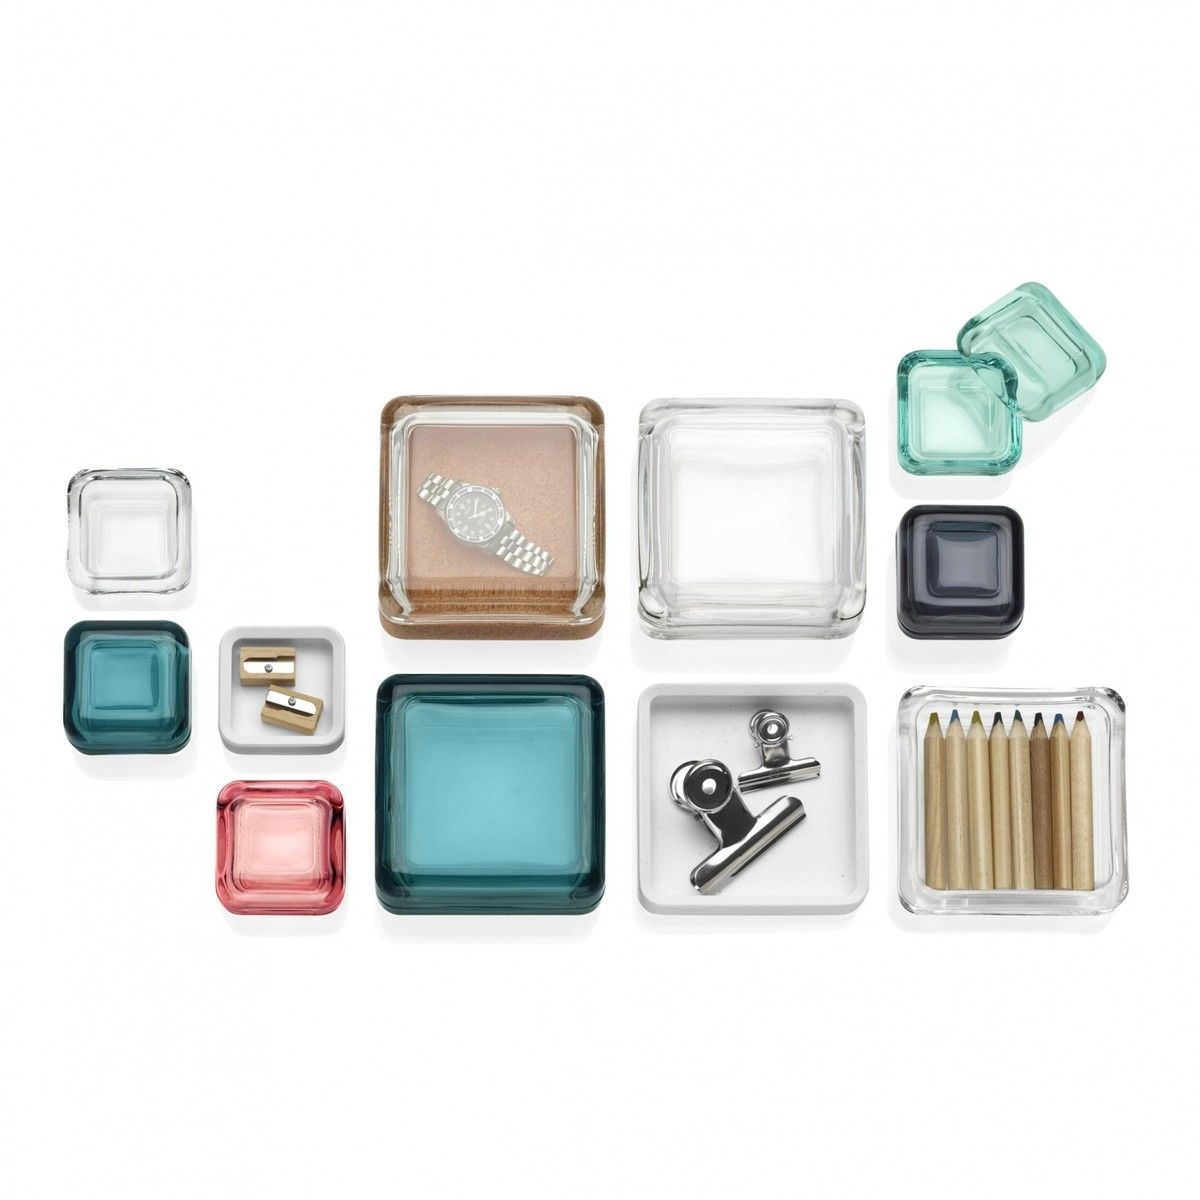 vitriini bo te vitrine en verre iittala bo tes bijoux rangement accessoires. Black Bedroom Furniture Sets. Home Design Ideas